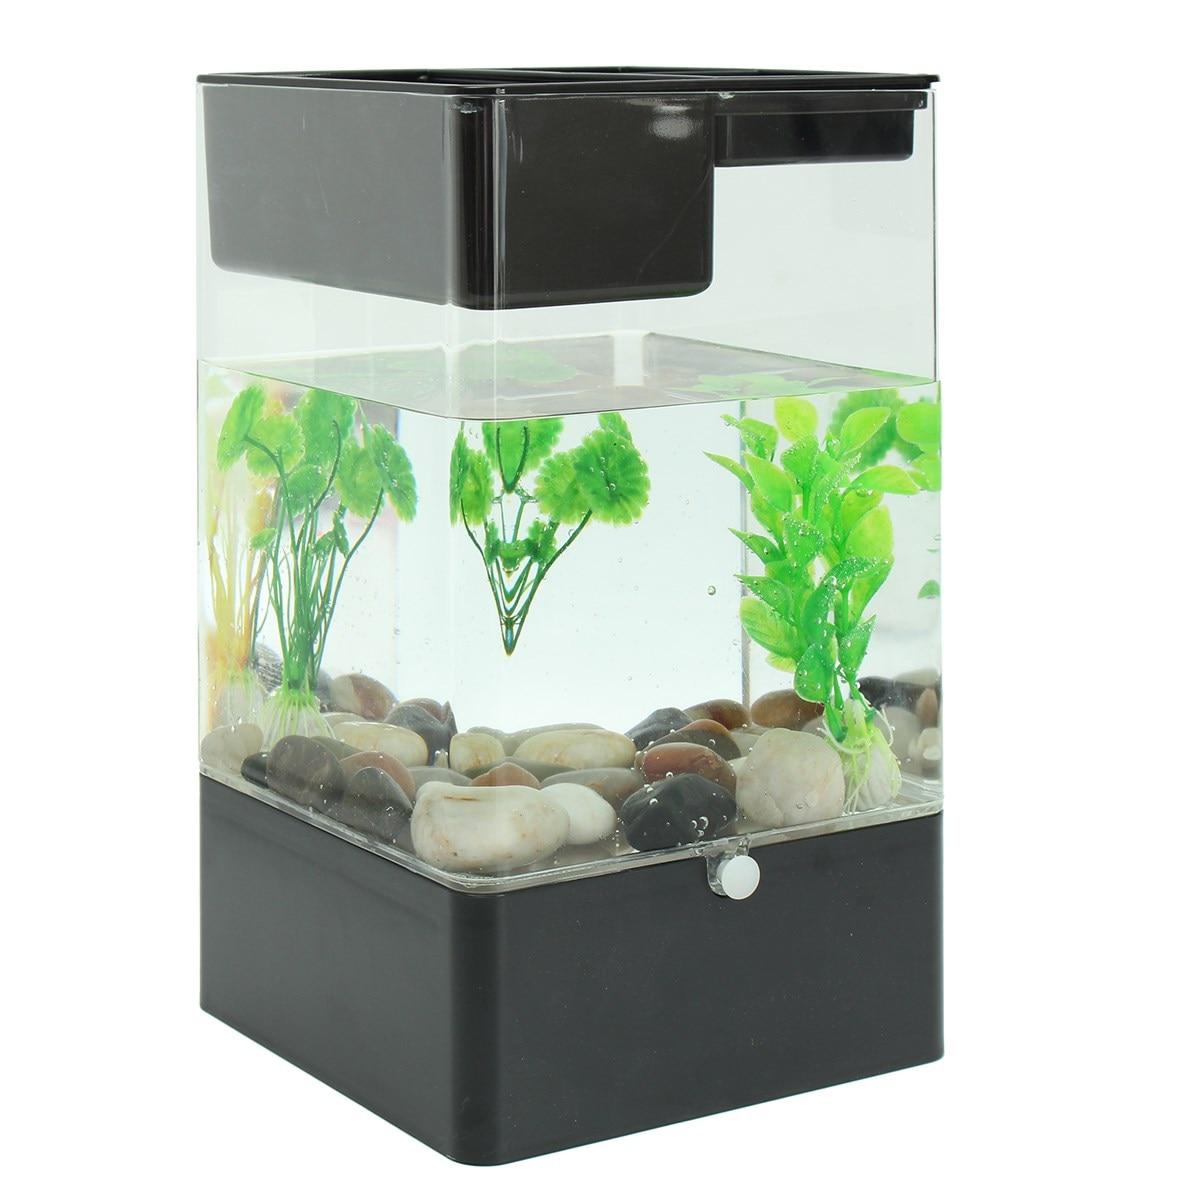 Fish aquarium price in pakistan - Ecological Fish Tank Square Usb Interface Aquarium Integration Office Desk Goldfish Filter Led Light System 14 4